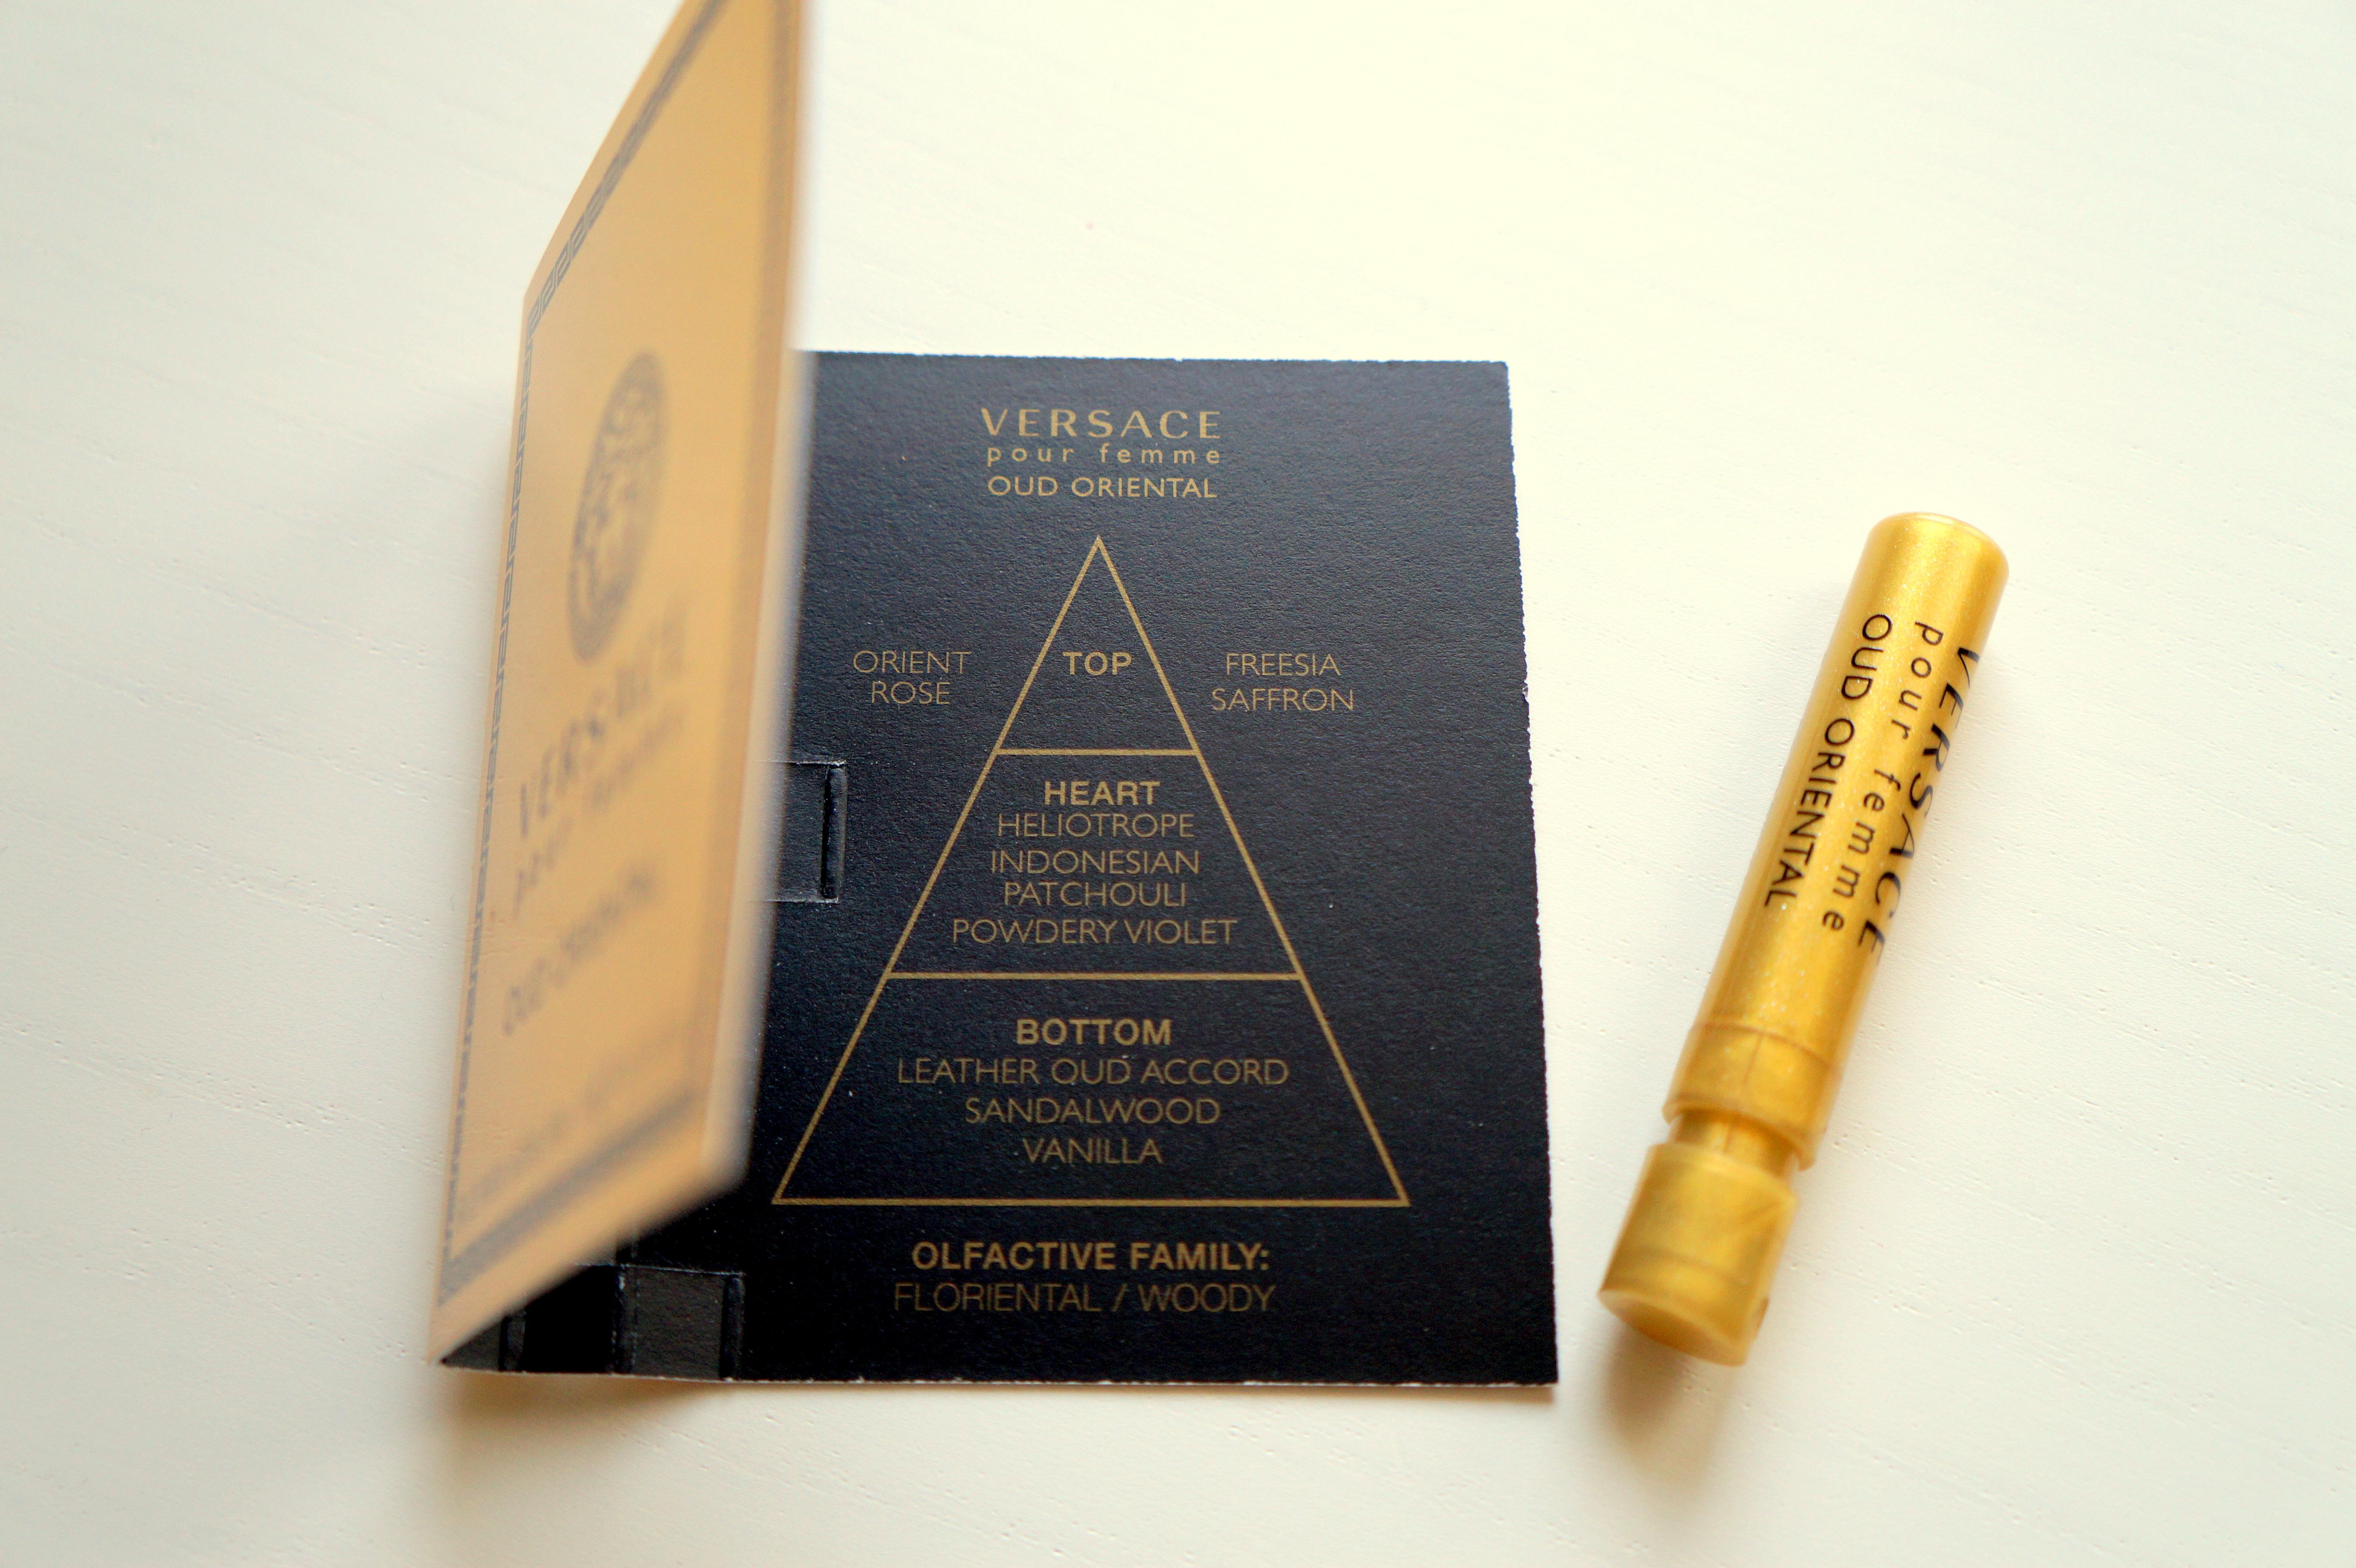 Versace-oudoriental-edpholiczka